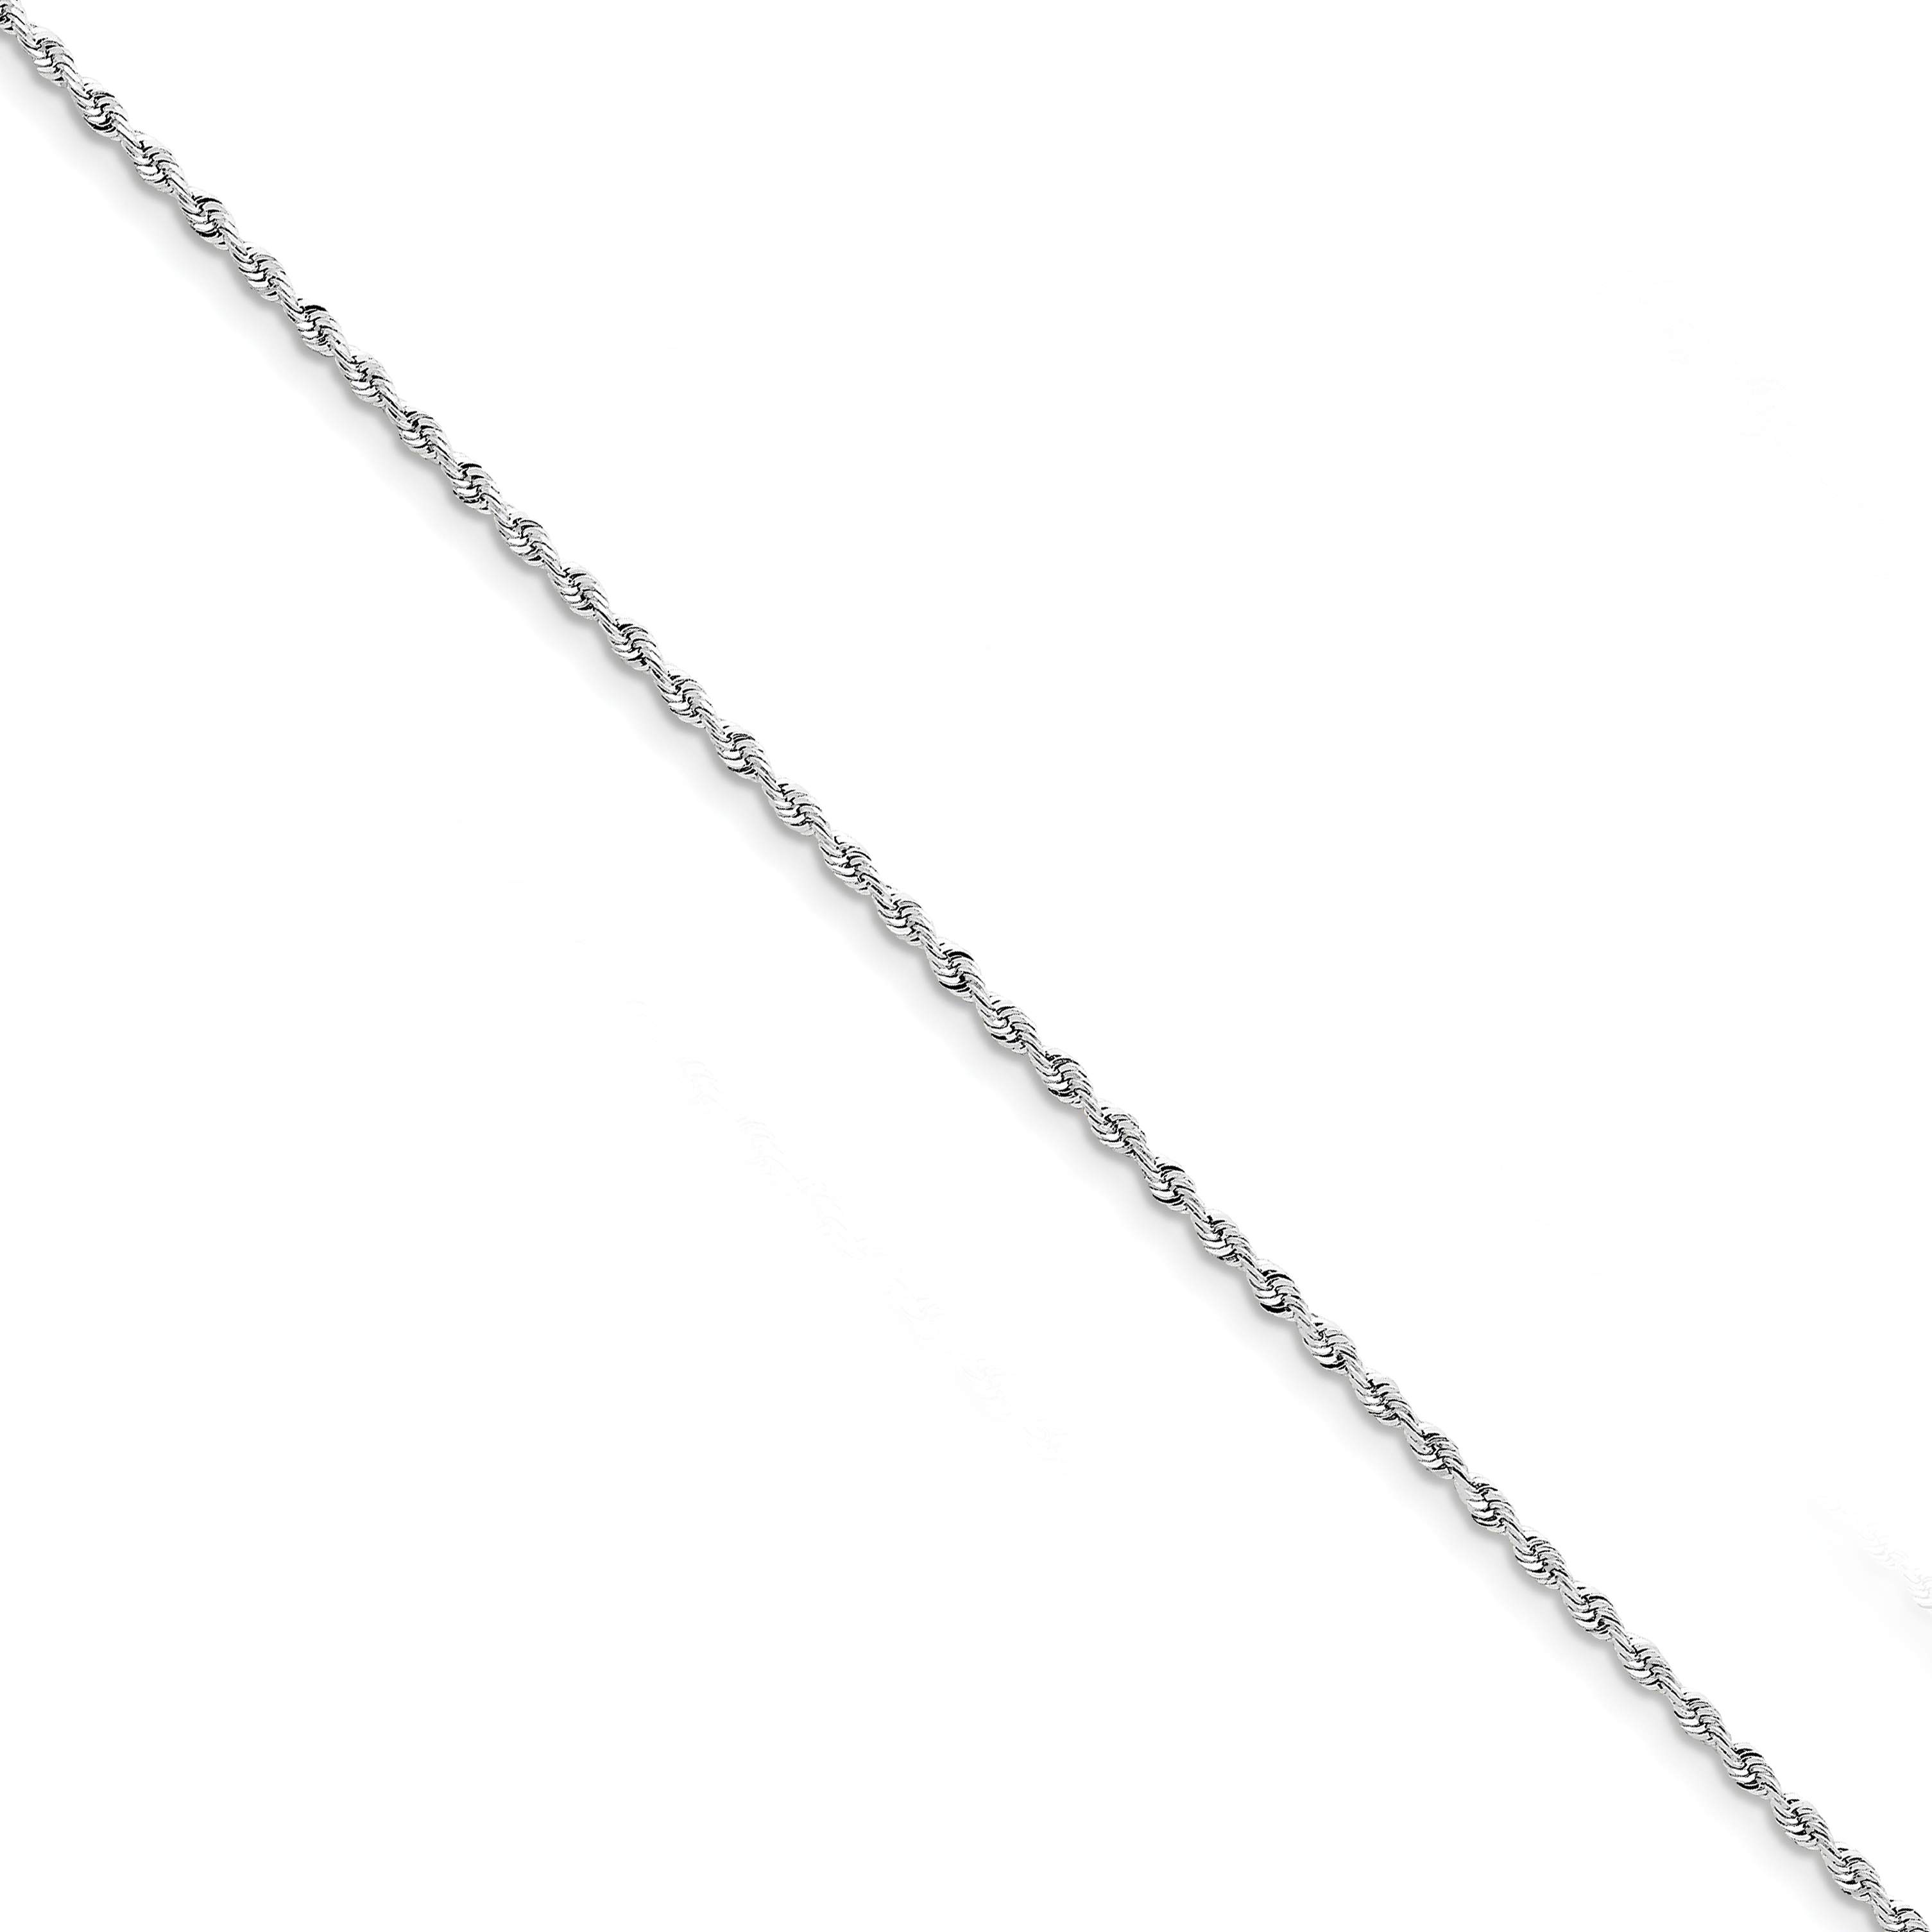 10K White Gold 2.25mm Diamond Cut Quadruple Rope Chain Anklet 9 Inch - image 2 de 2